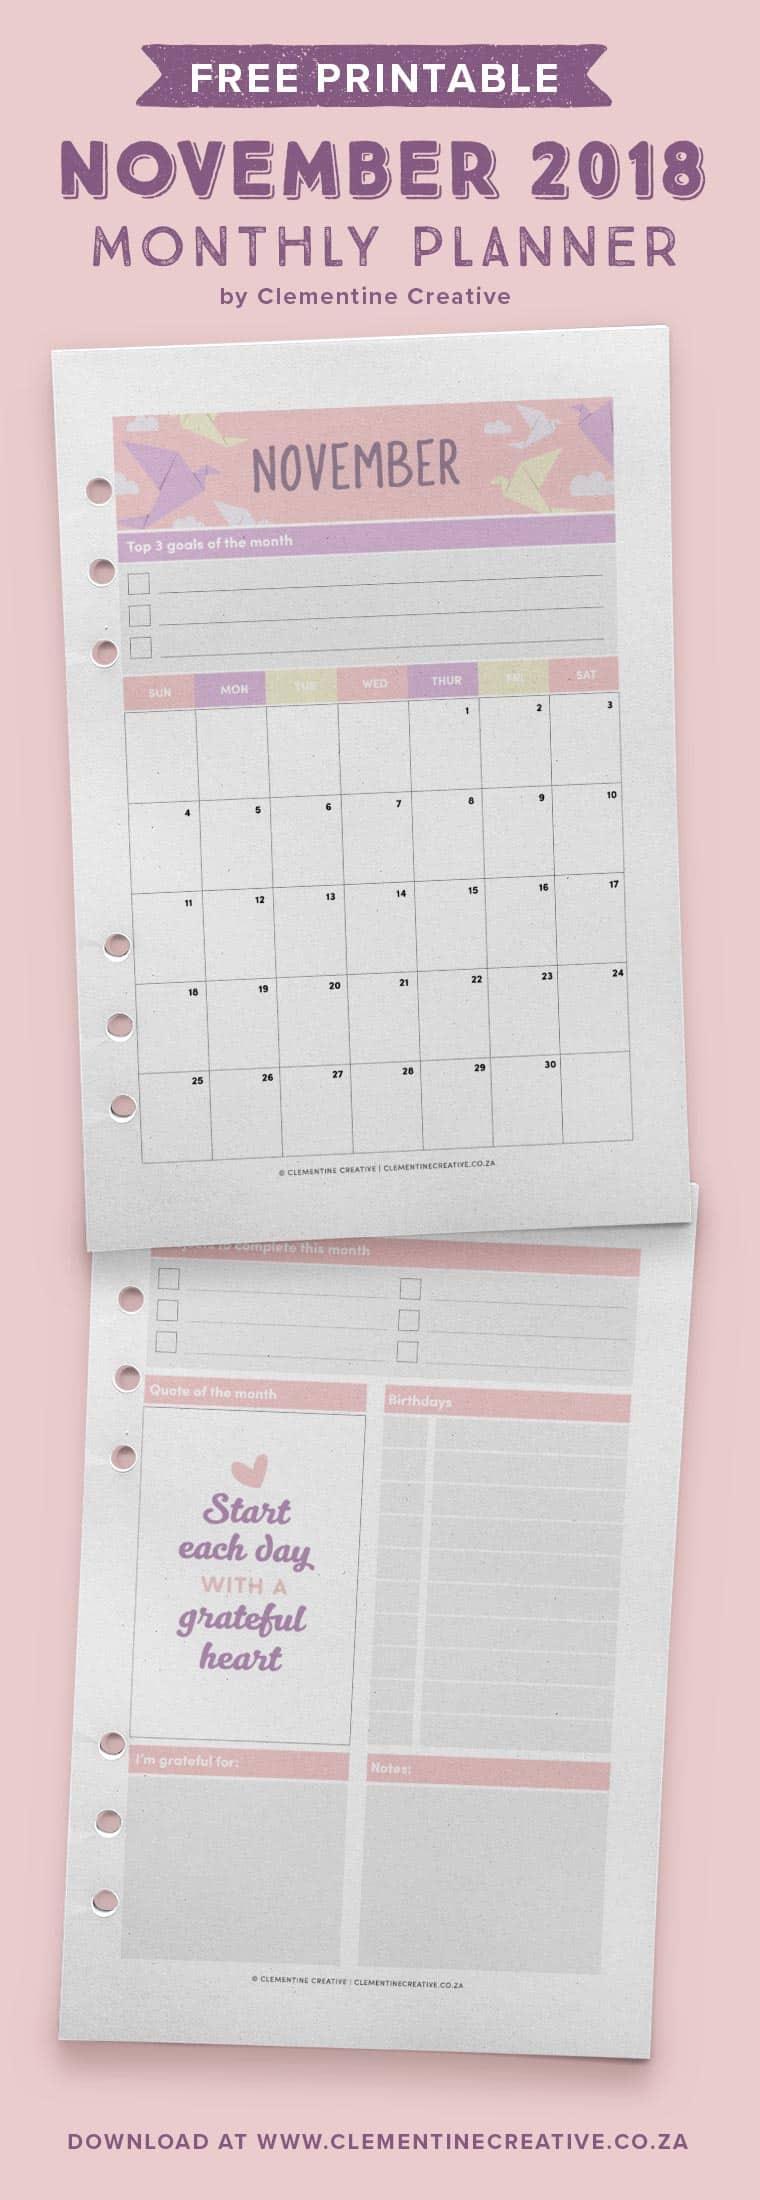 November 2018 free monthly planner